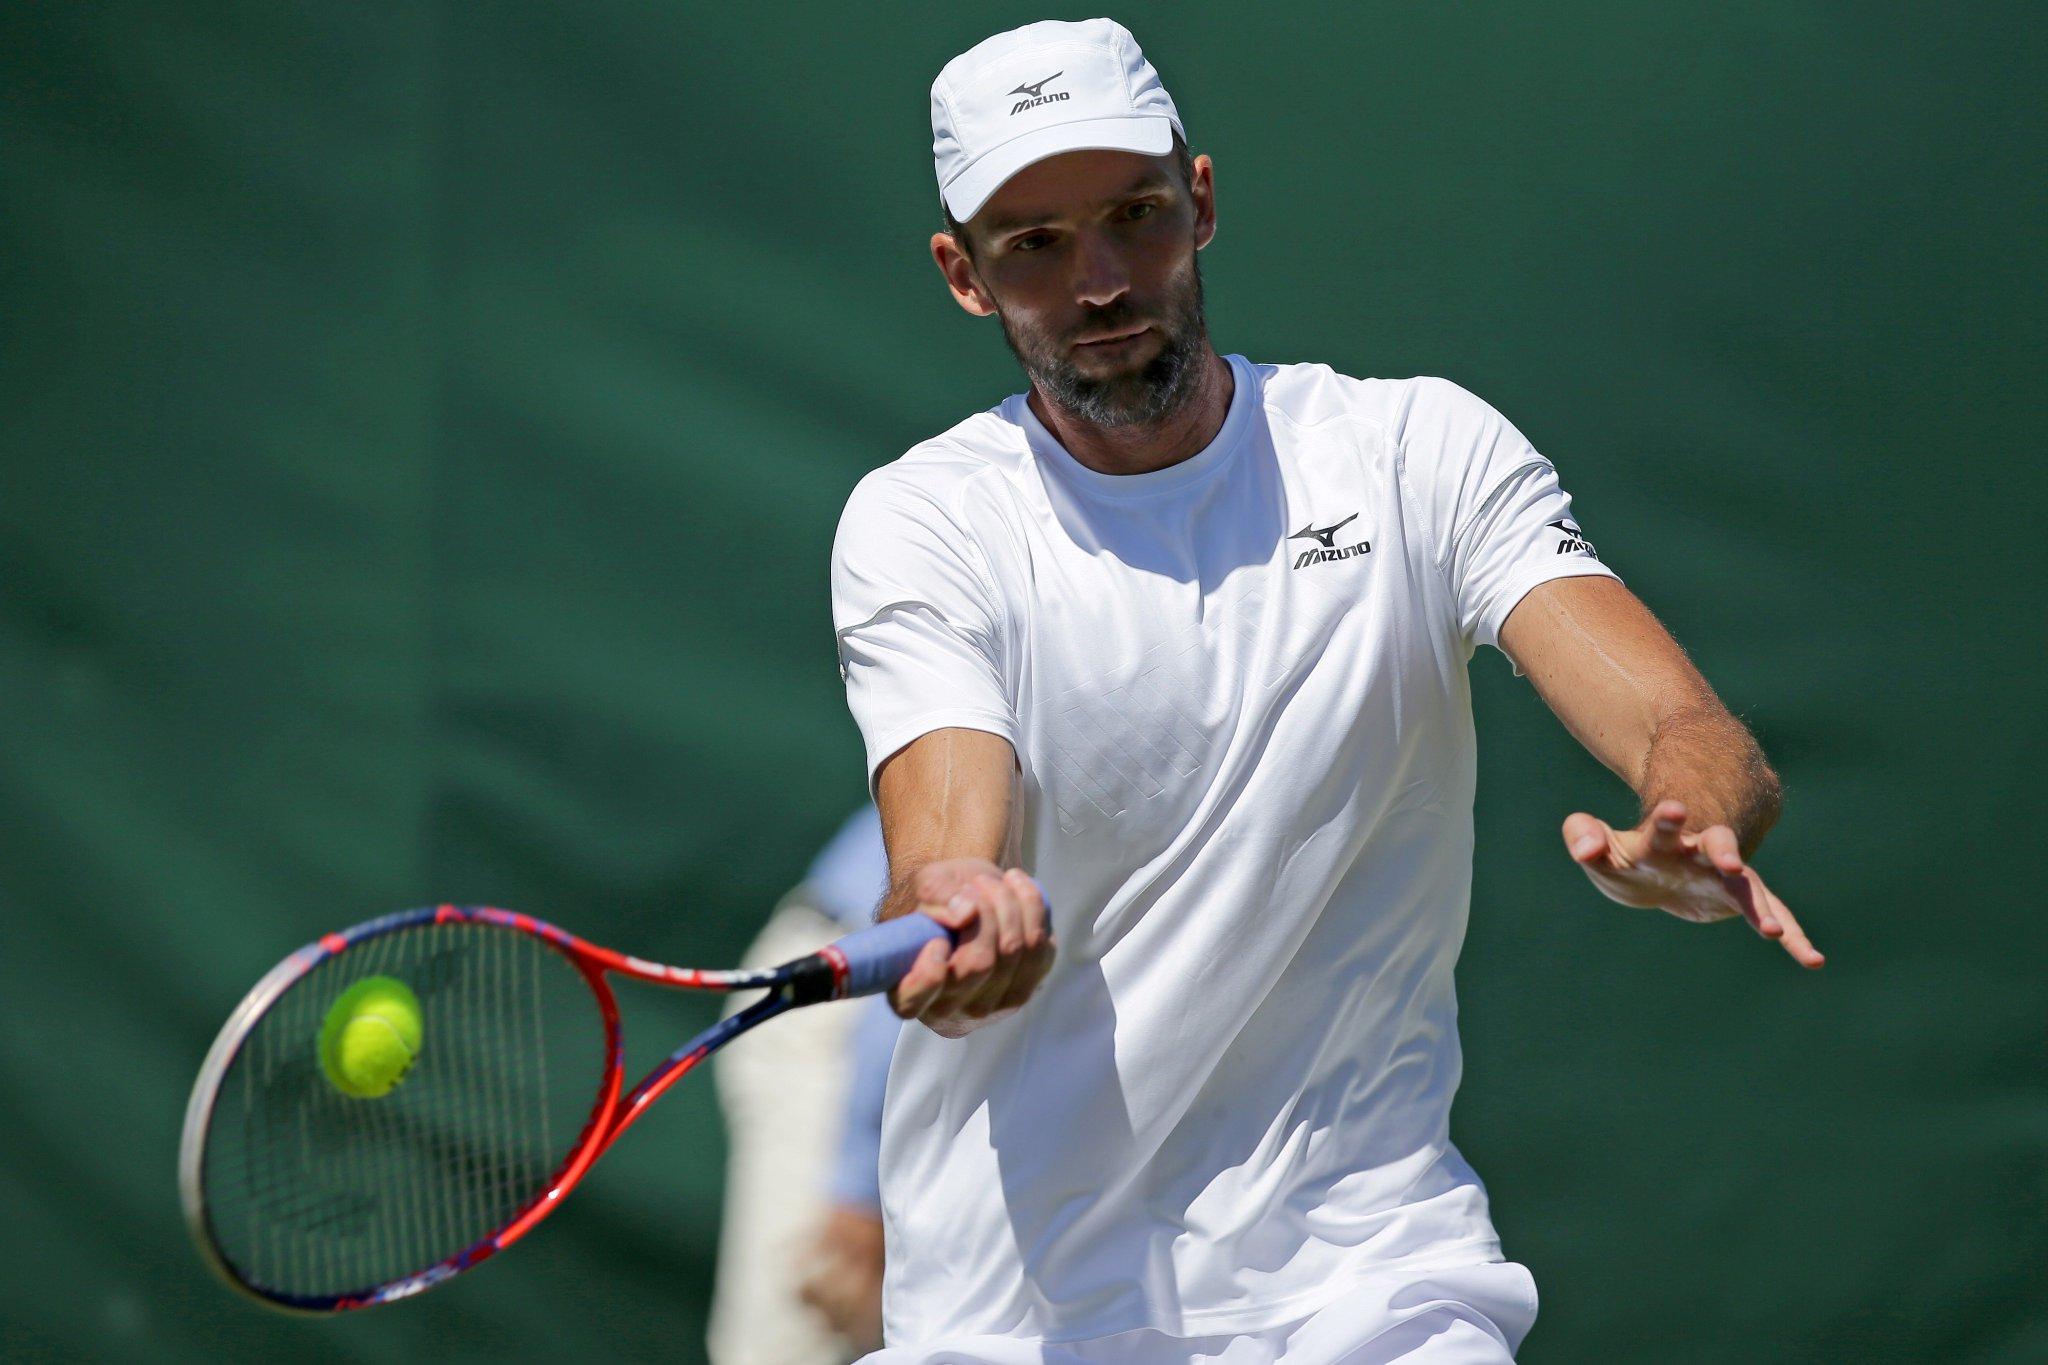 Ivo Karlovic's ace count: 5⃣8⃣ (‼️)  Keep 'em comin' ��  #Wimbledon https://t.co/FzPdJ5ORKb